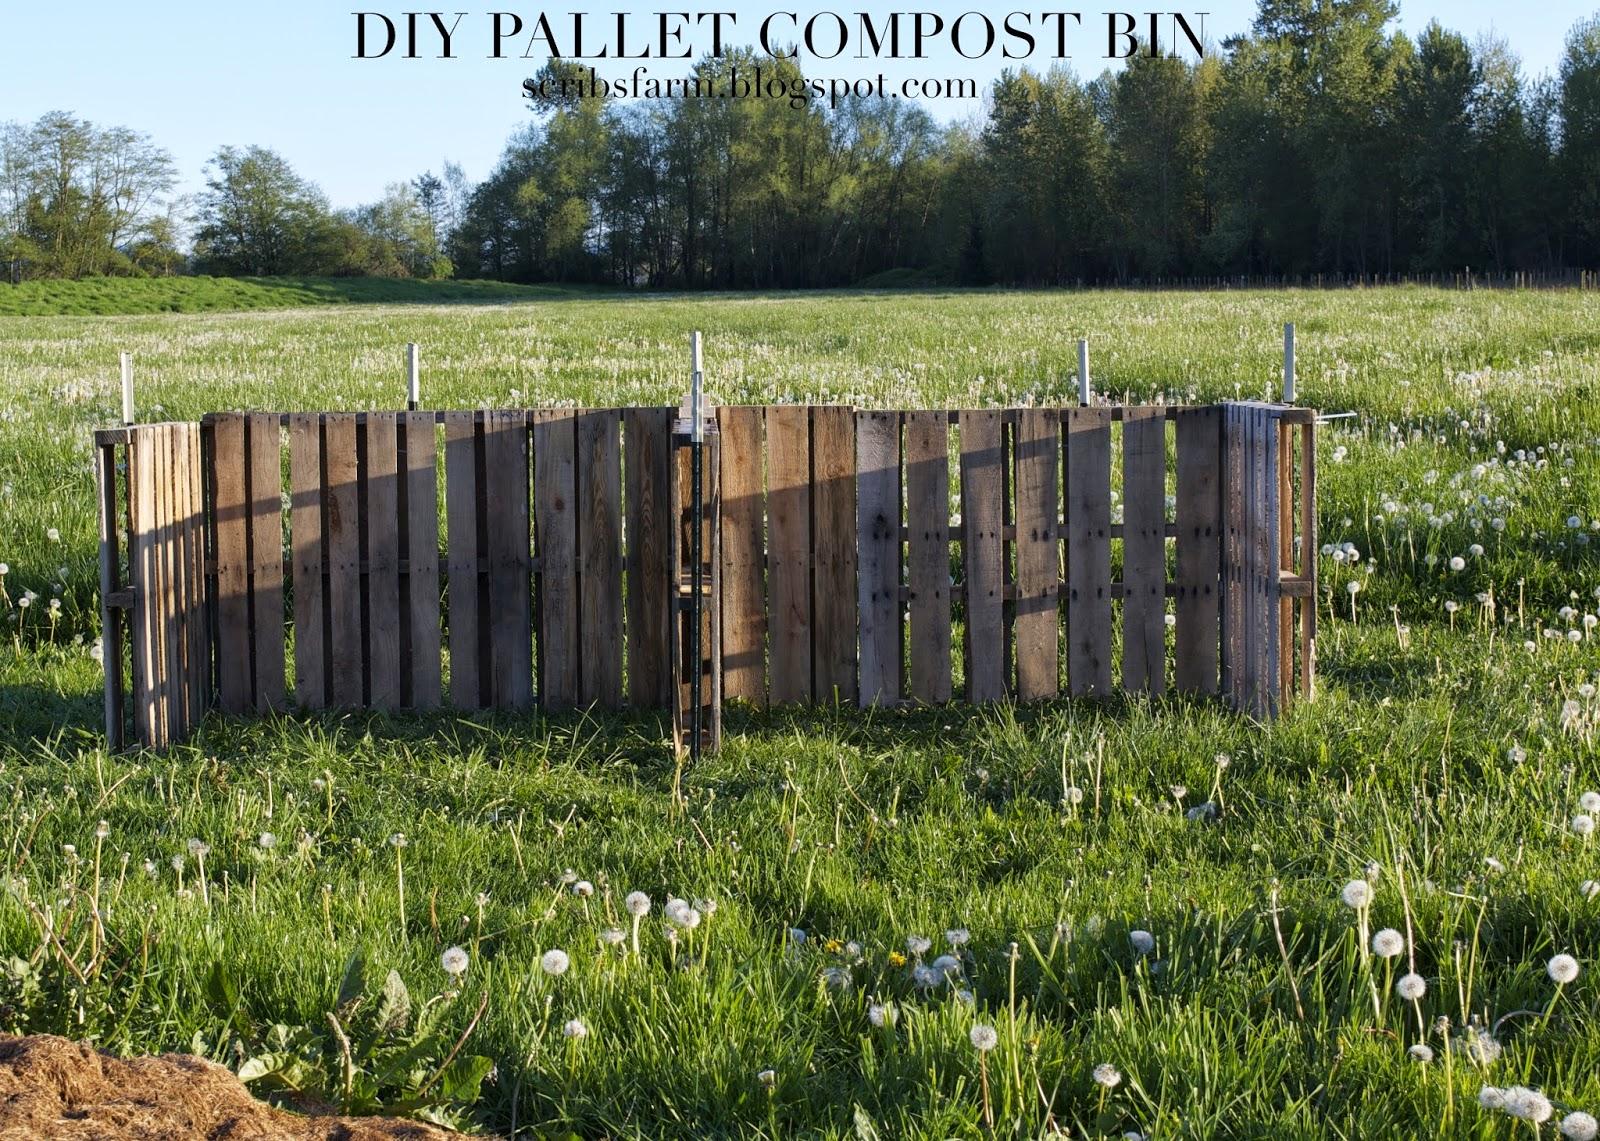 6 pallet compost bin